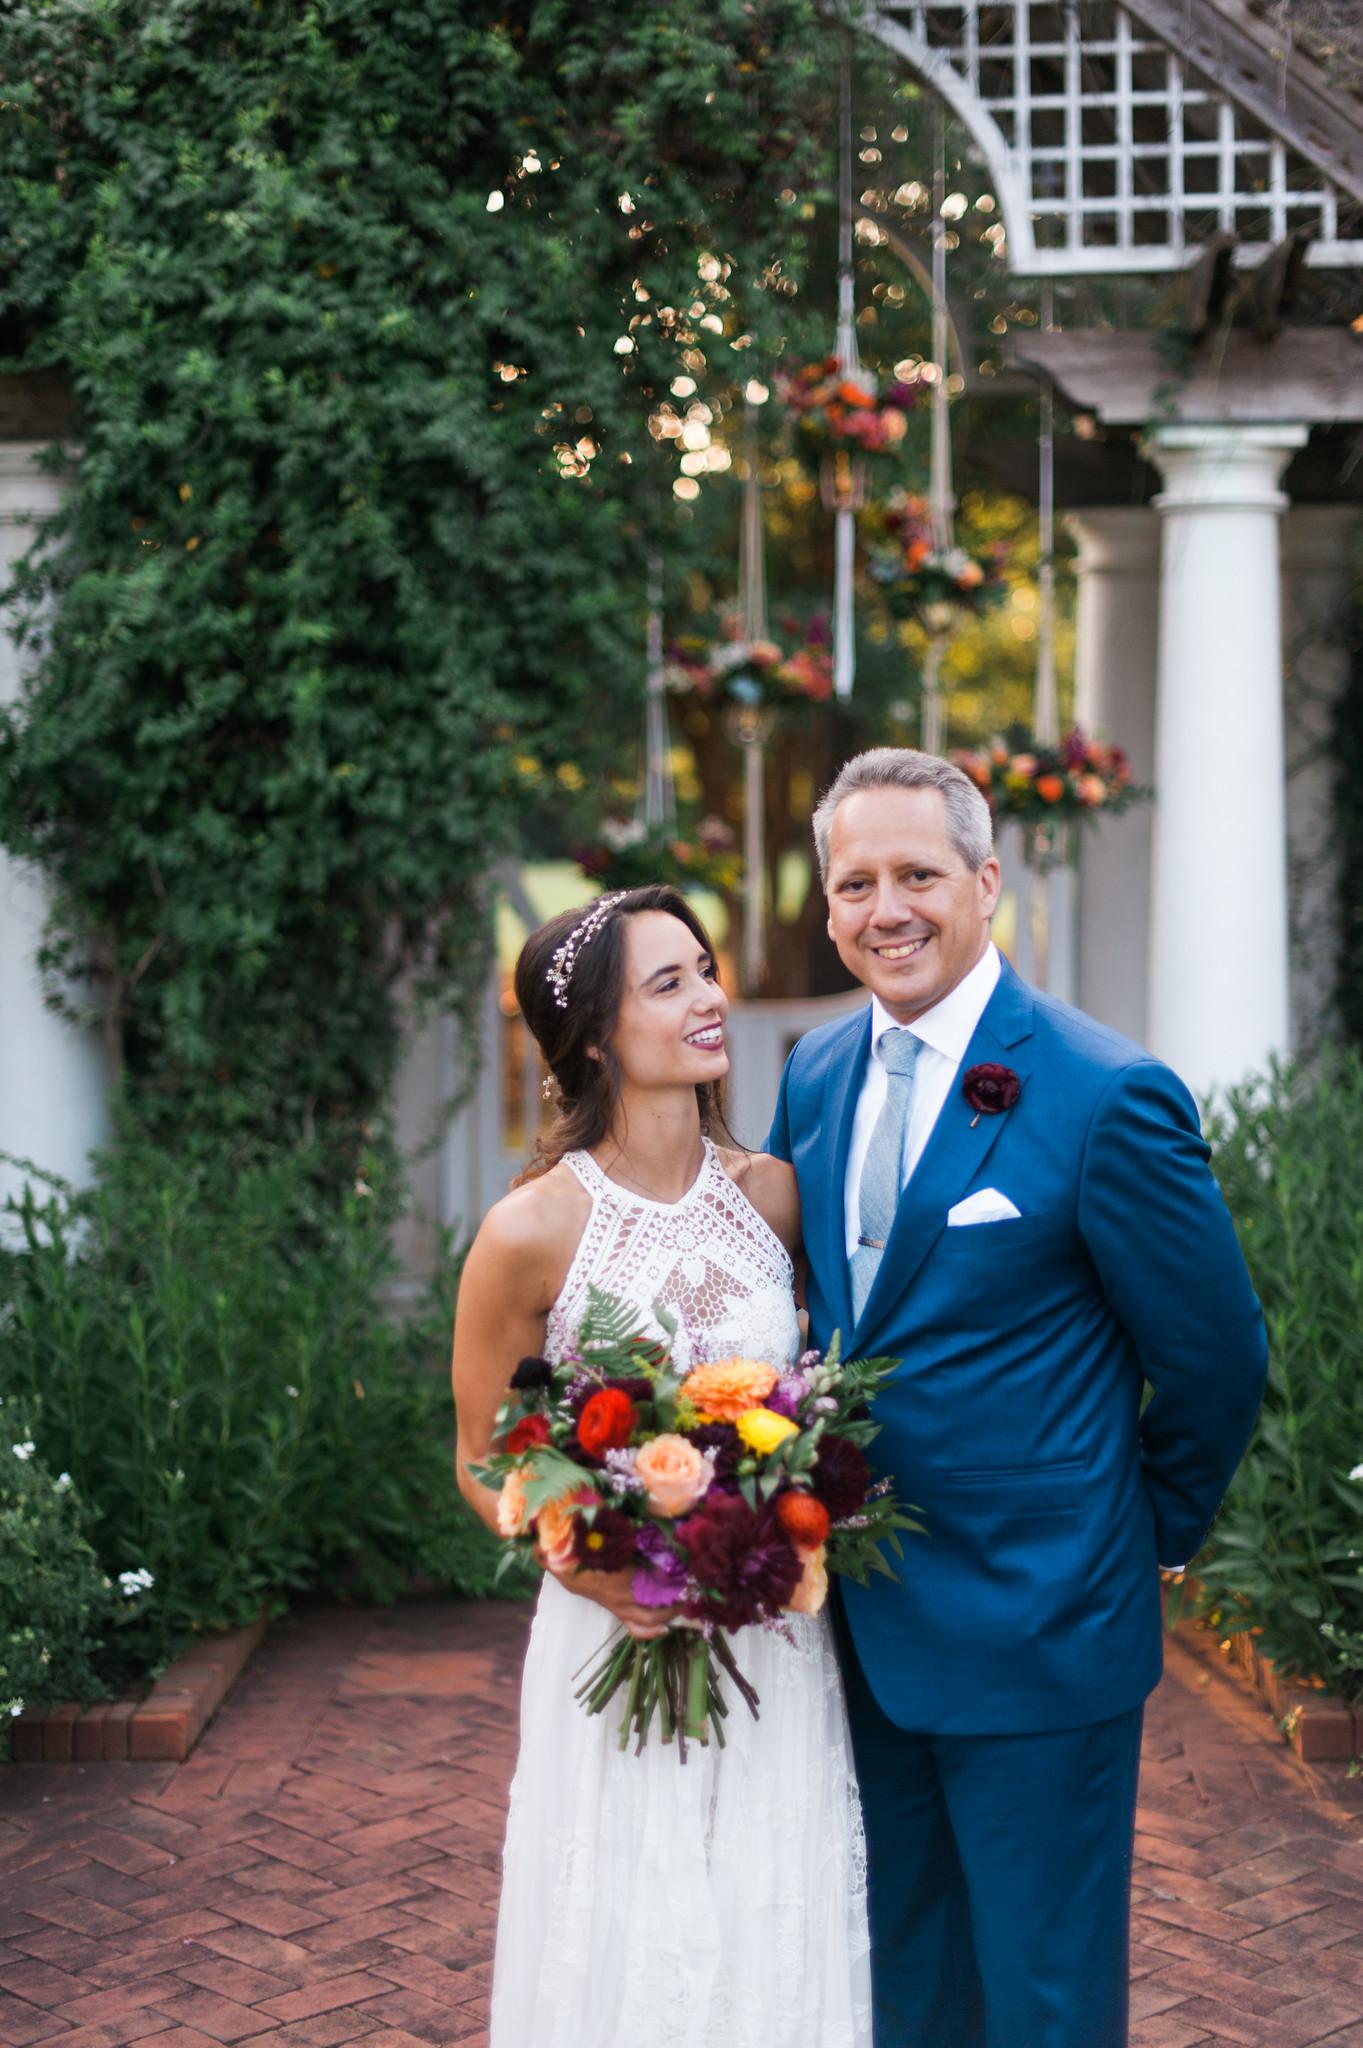 thomas-wedding-289-X4.jpg